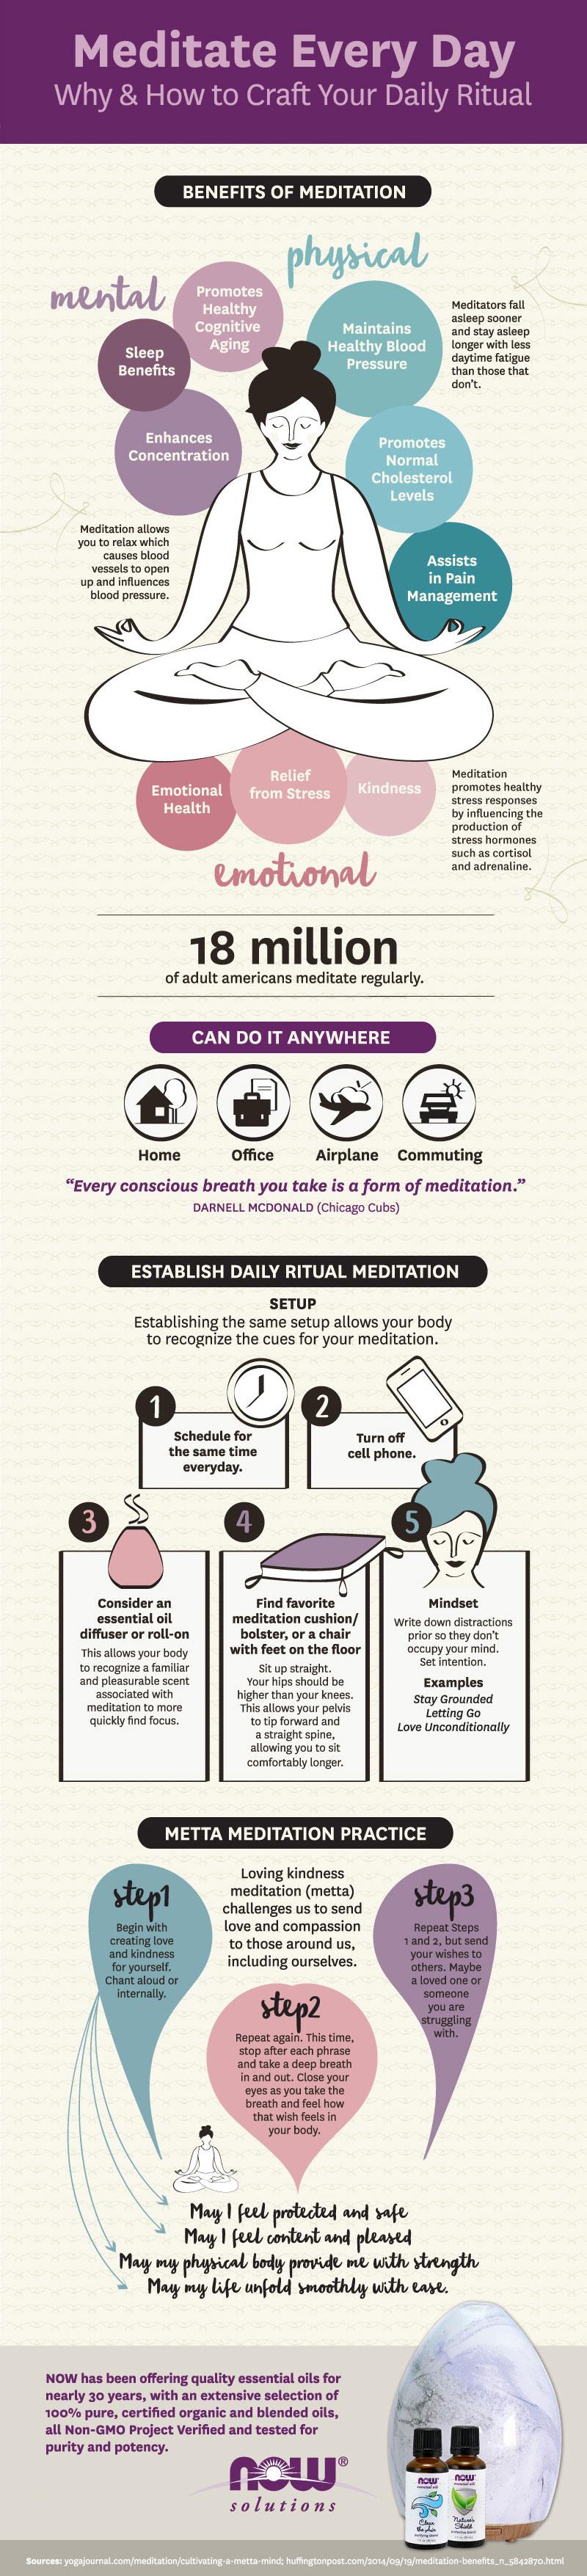 meditation infographic jpg